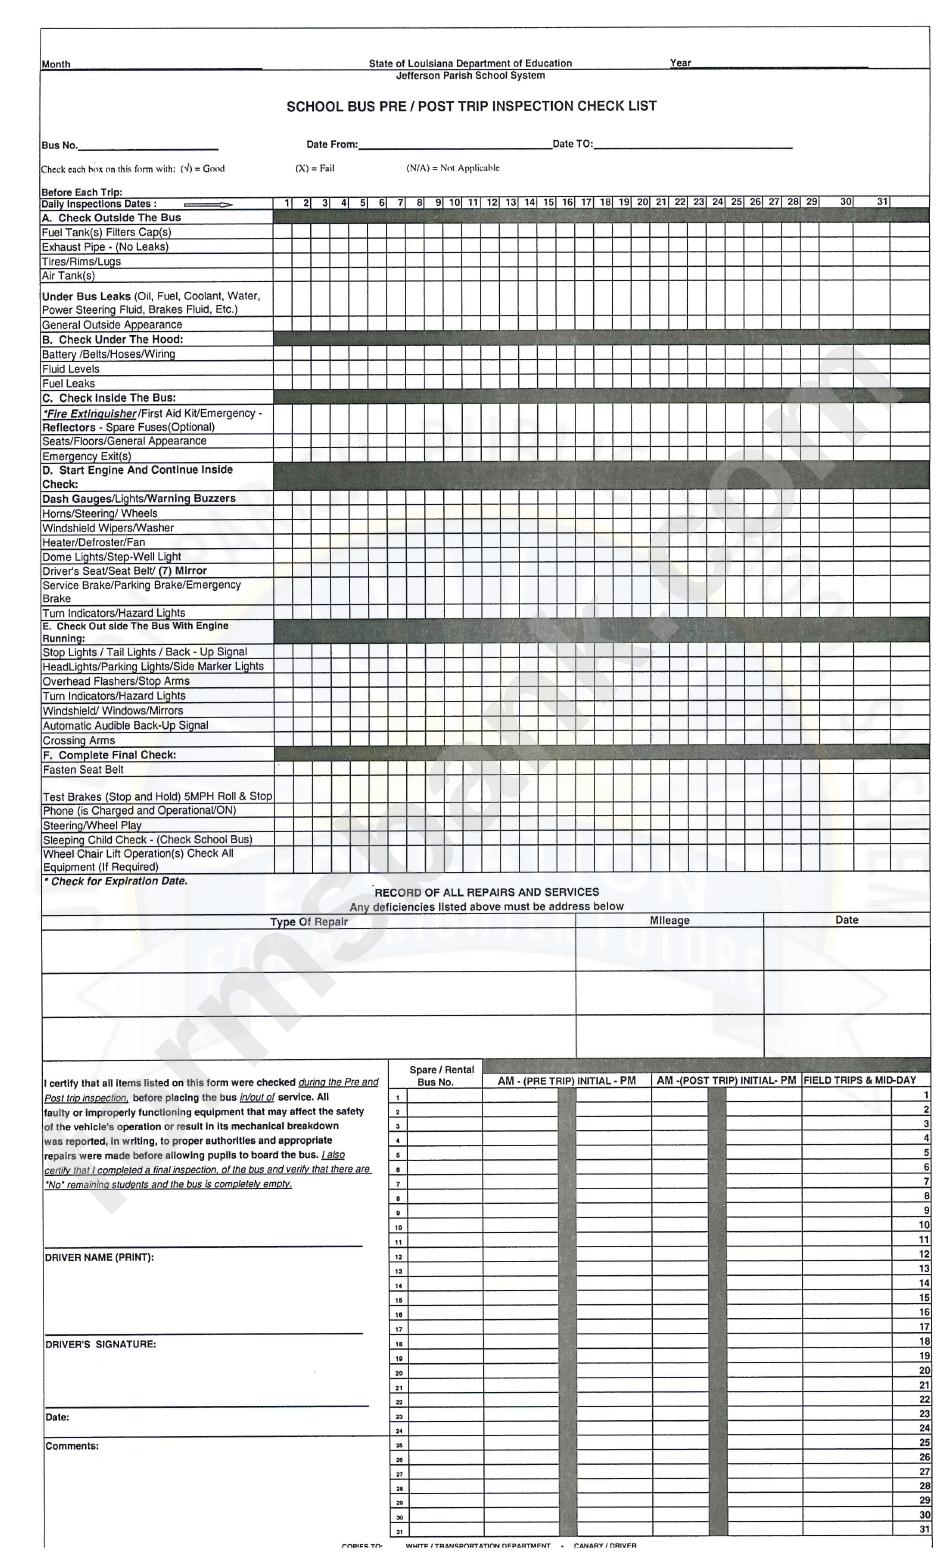 School Bus Pre/post Trip Inspection Check List Template